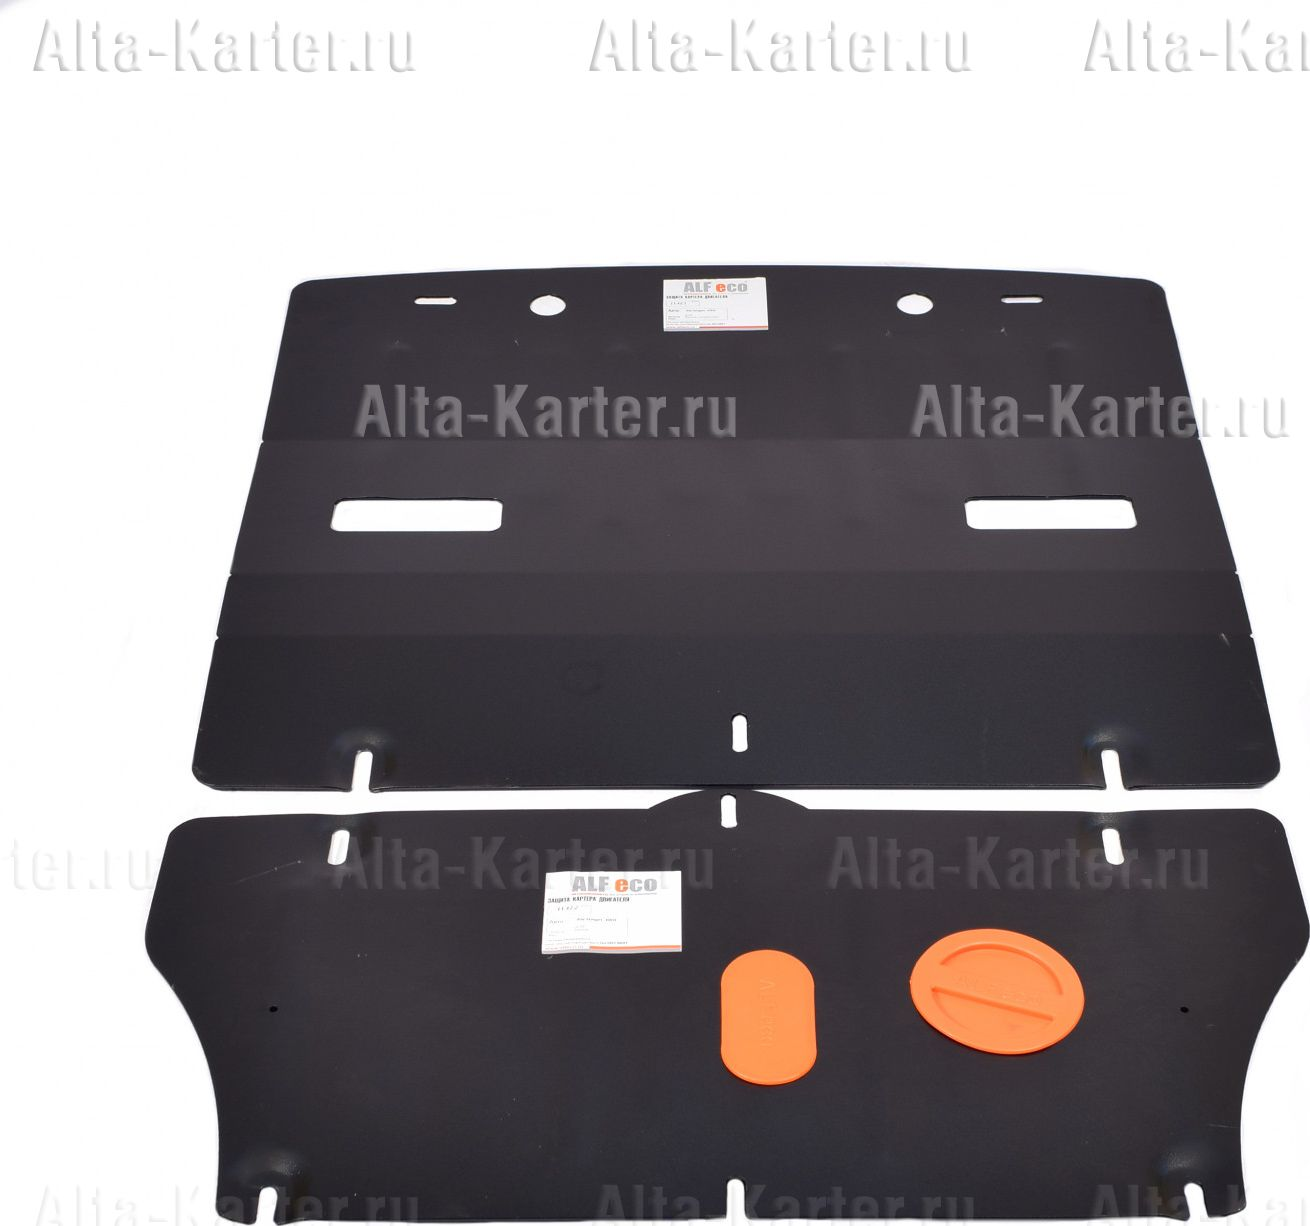 Защита Alfeco для радиатора, рулевой рейки и картера Kia Stinger 4WD (2 части) 2,0Т 2018-2021. Артикул ALF.11.42